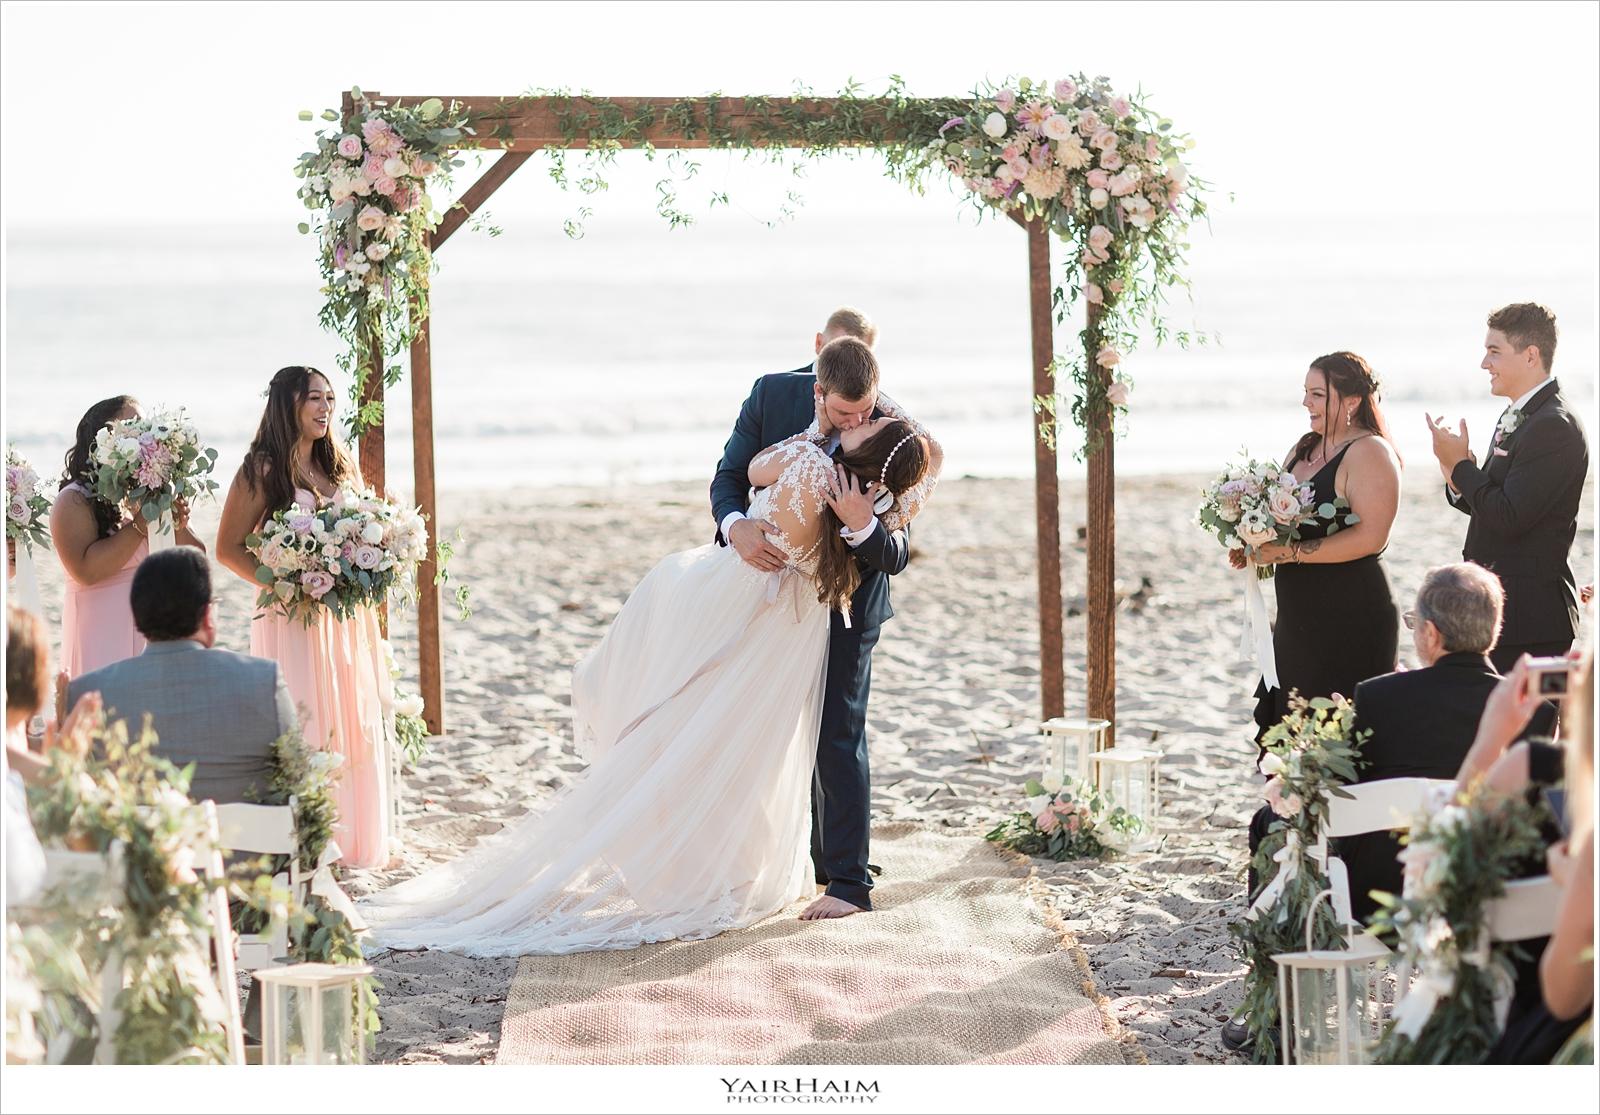 Chrystle-Robbie-wedding-photos-613.JPG